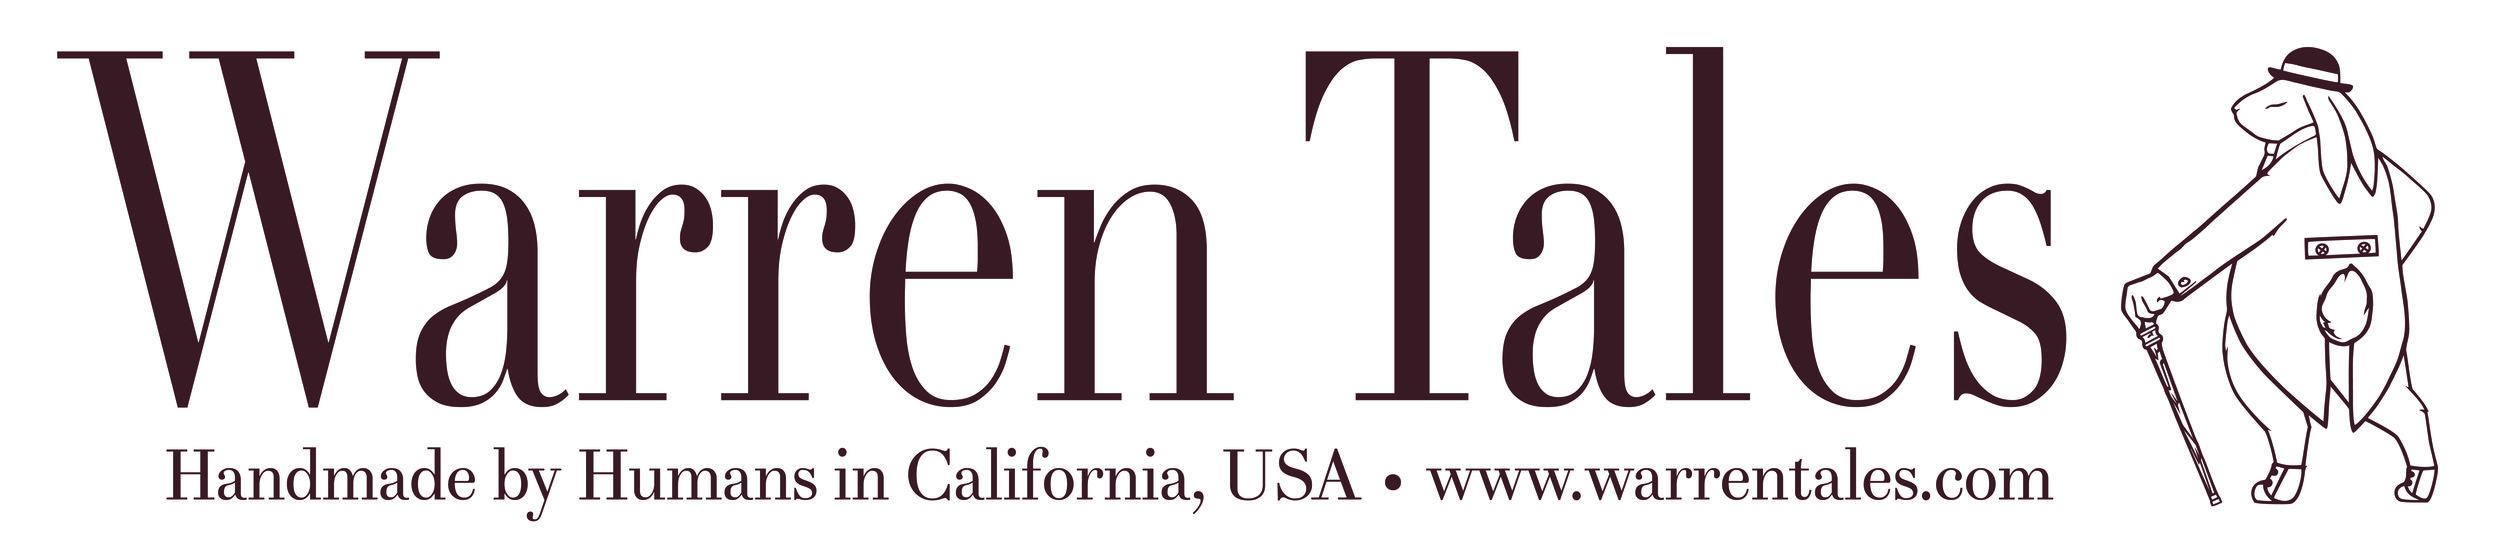 Warren Tales Logo (CMYK Color)_Indie Market.jpg